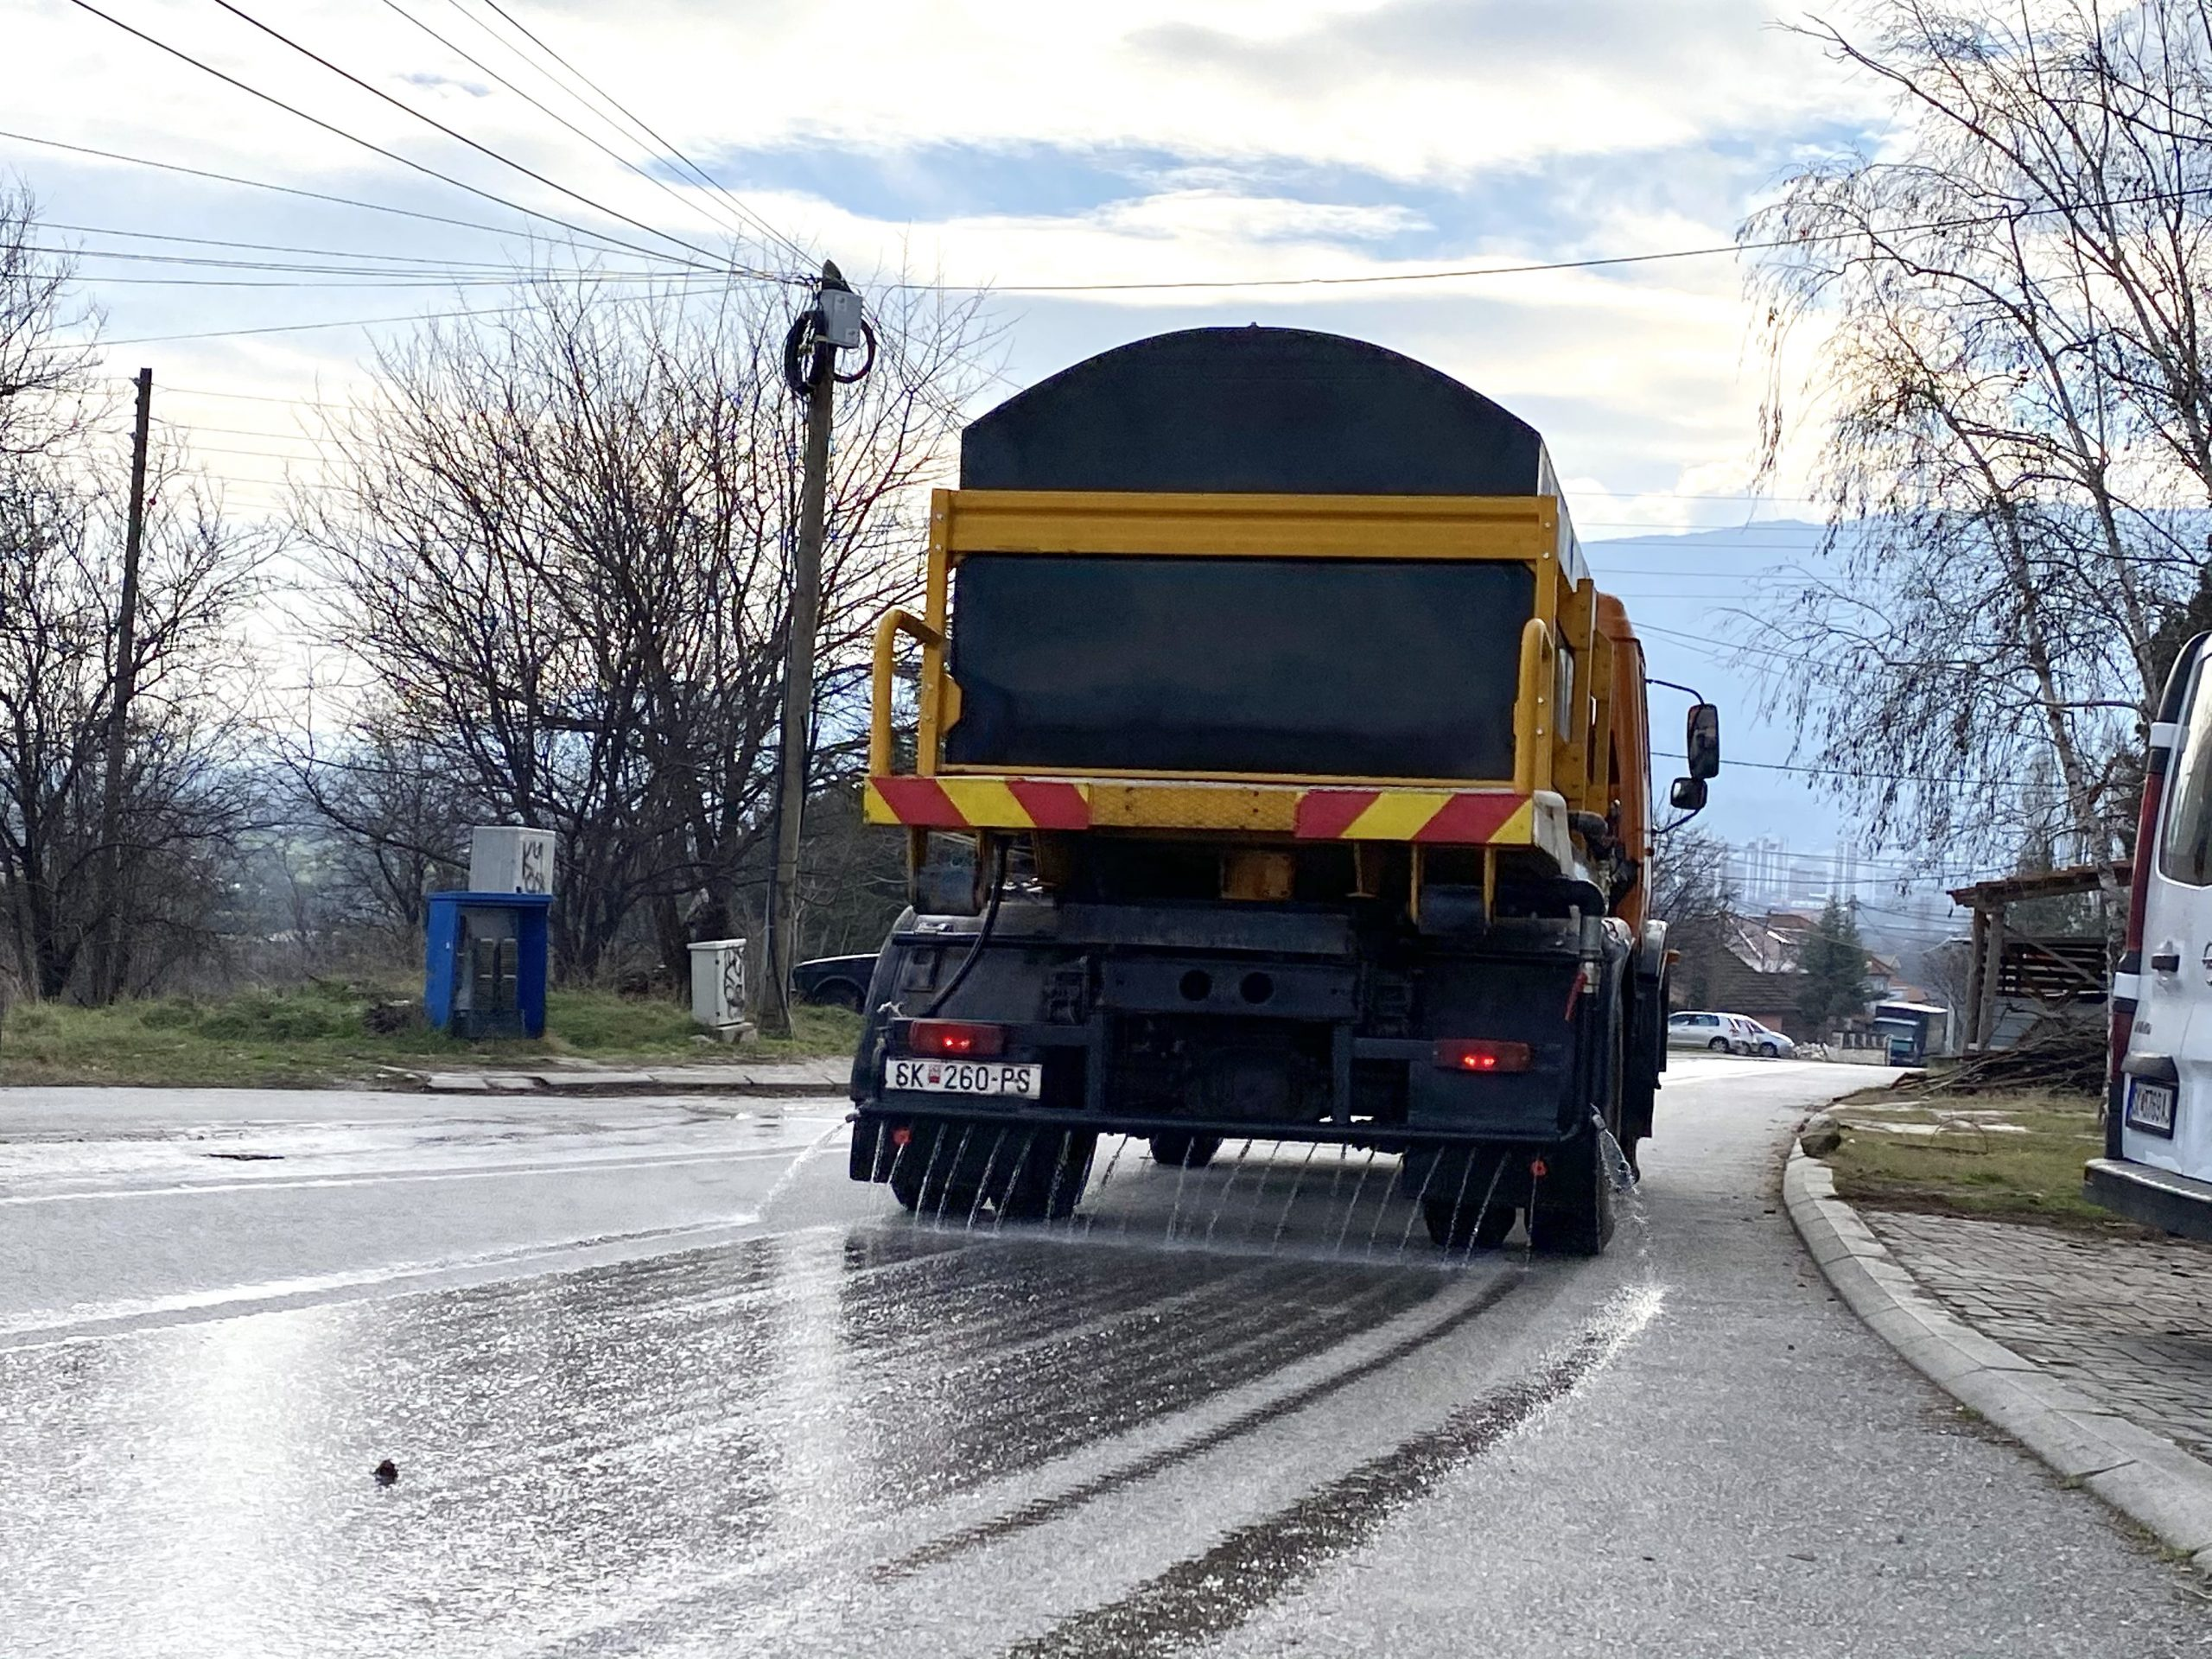 општина карпош opstina karpos